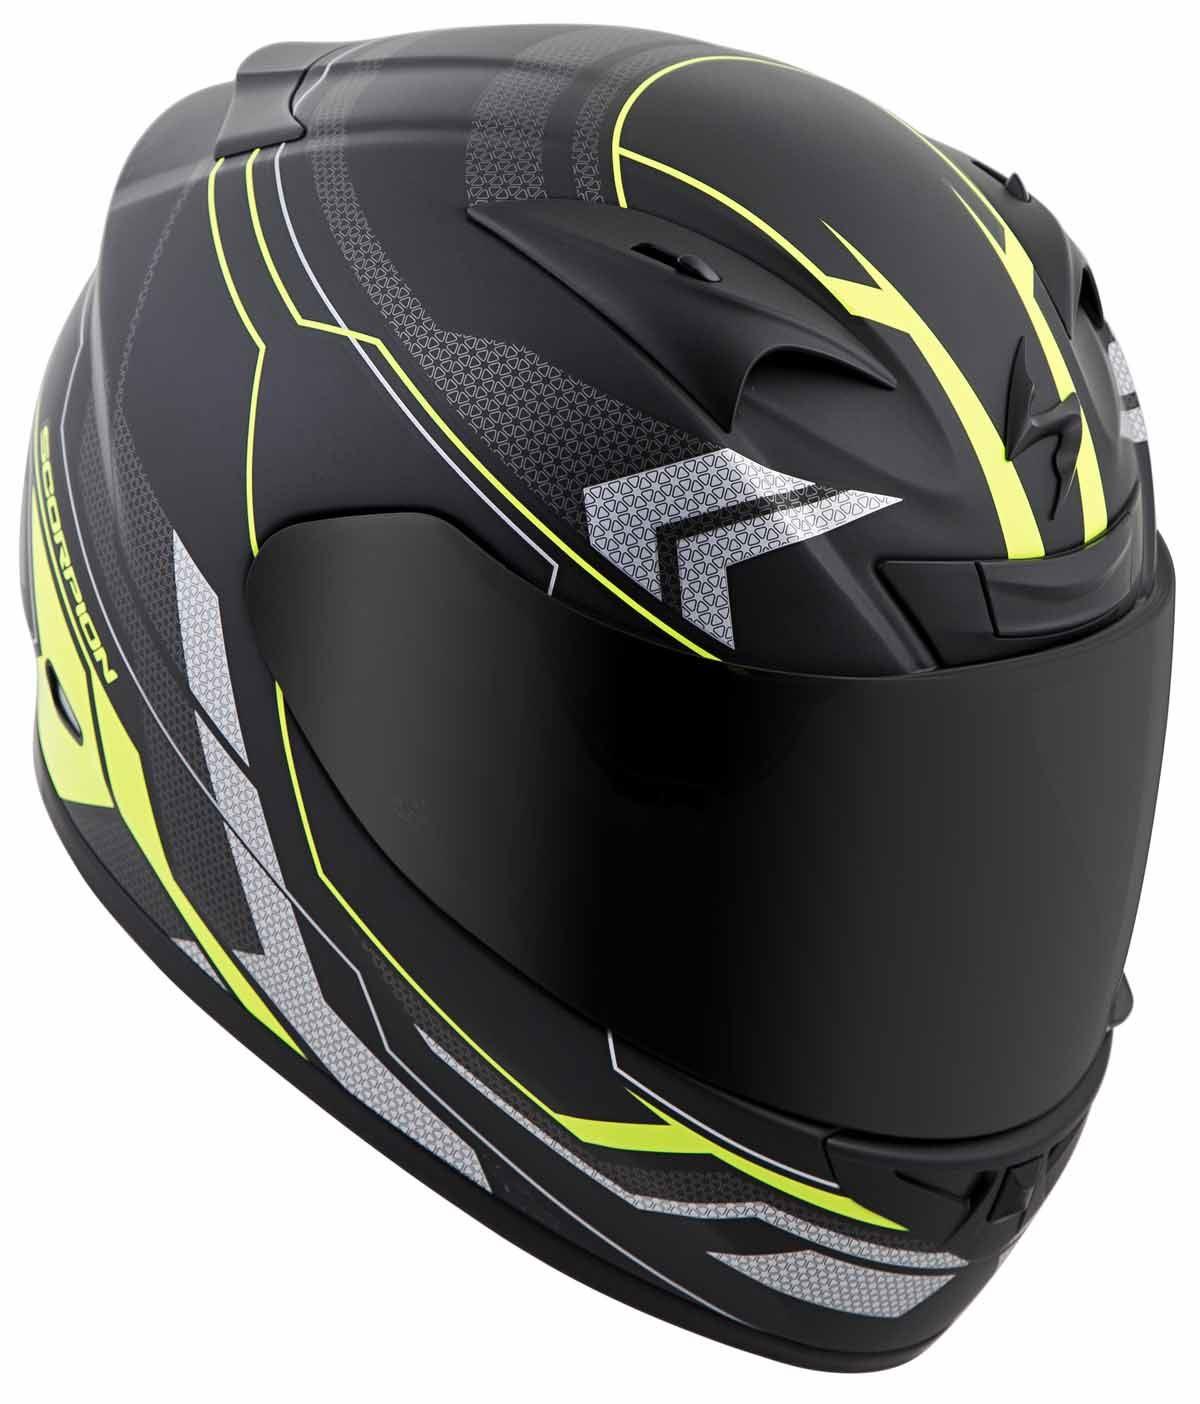 Scorpion-EXO-R710-Helmet-Fiberglass-Full-Face-DOT-SNELL-M2015-Certified-XS-2XL miniature 33